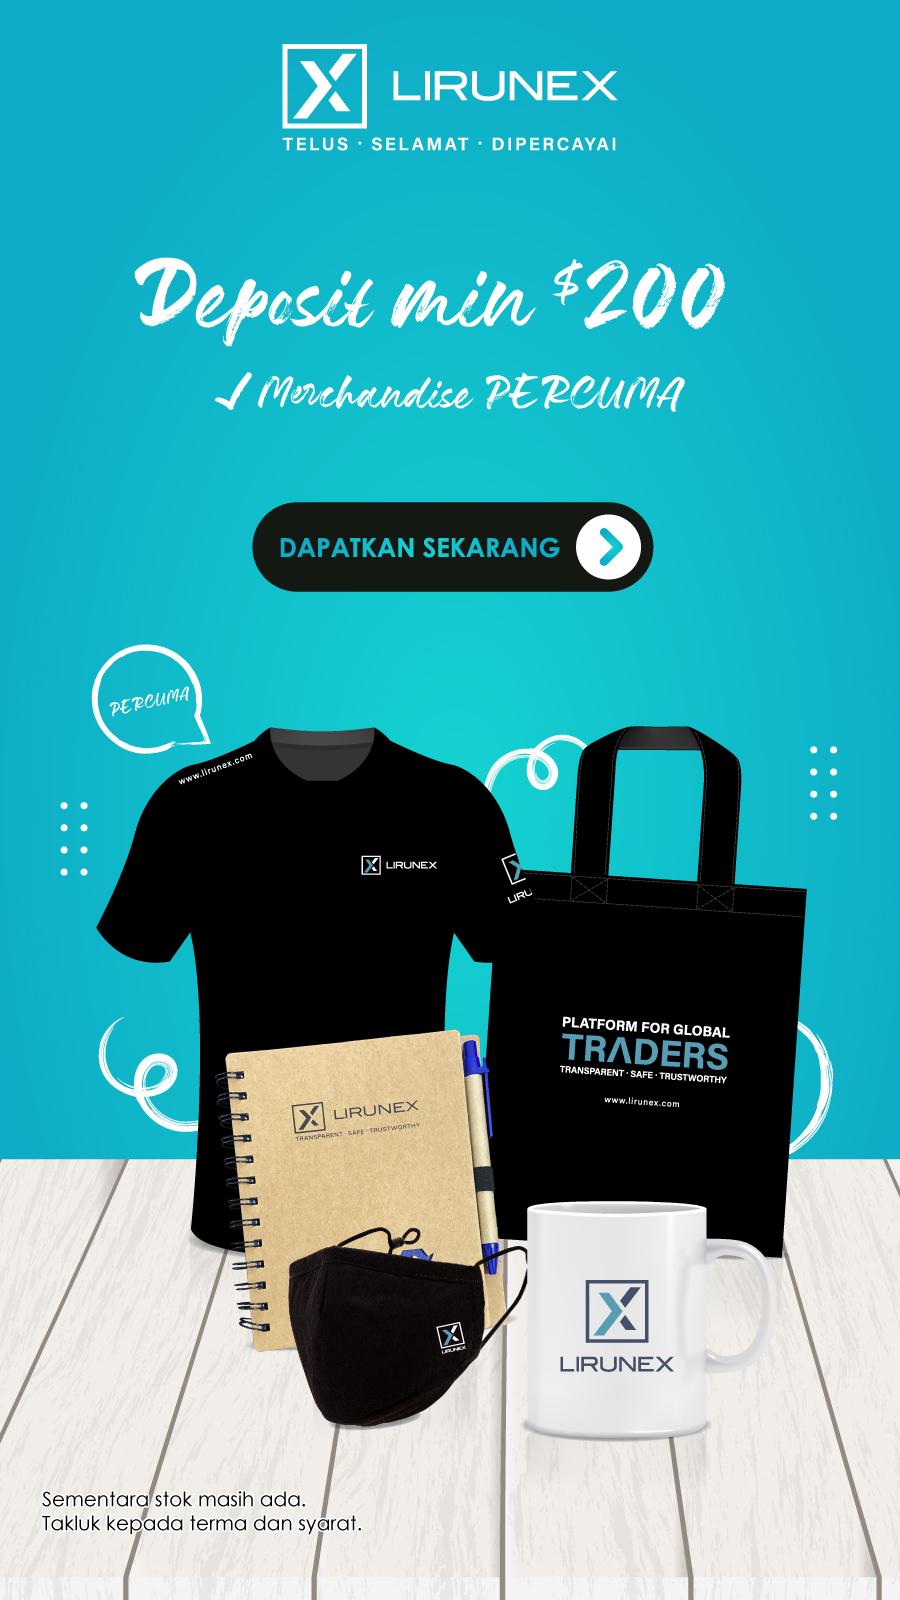 Lirunex Merchandise